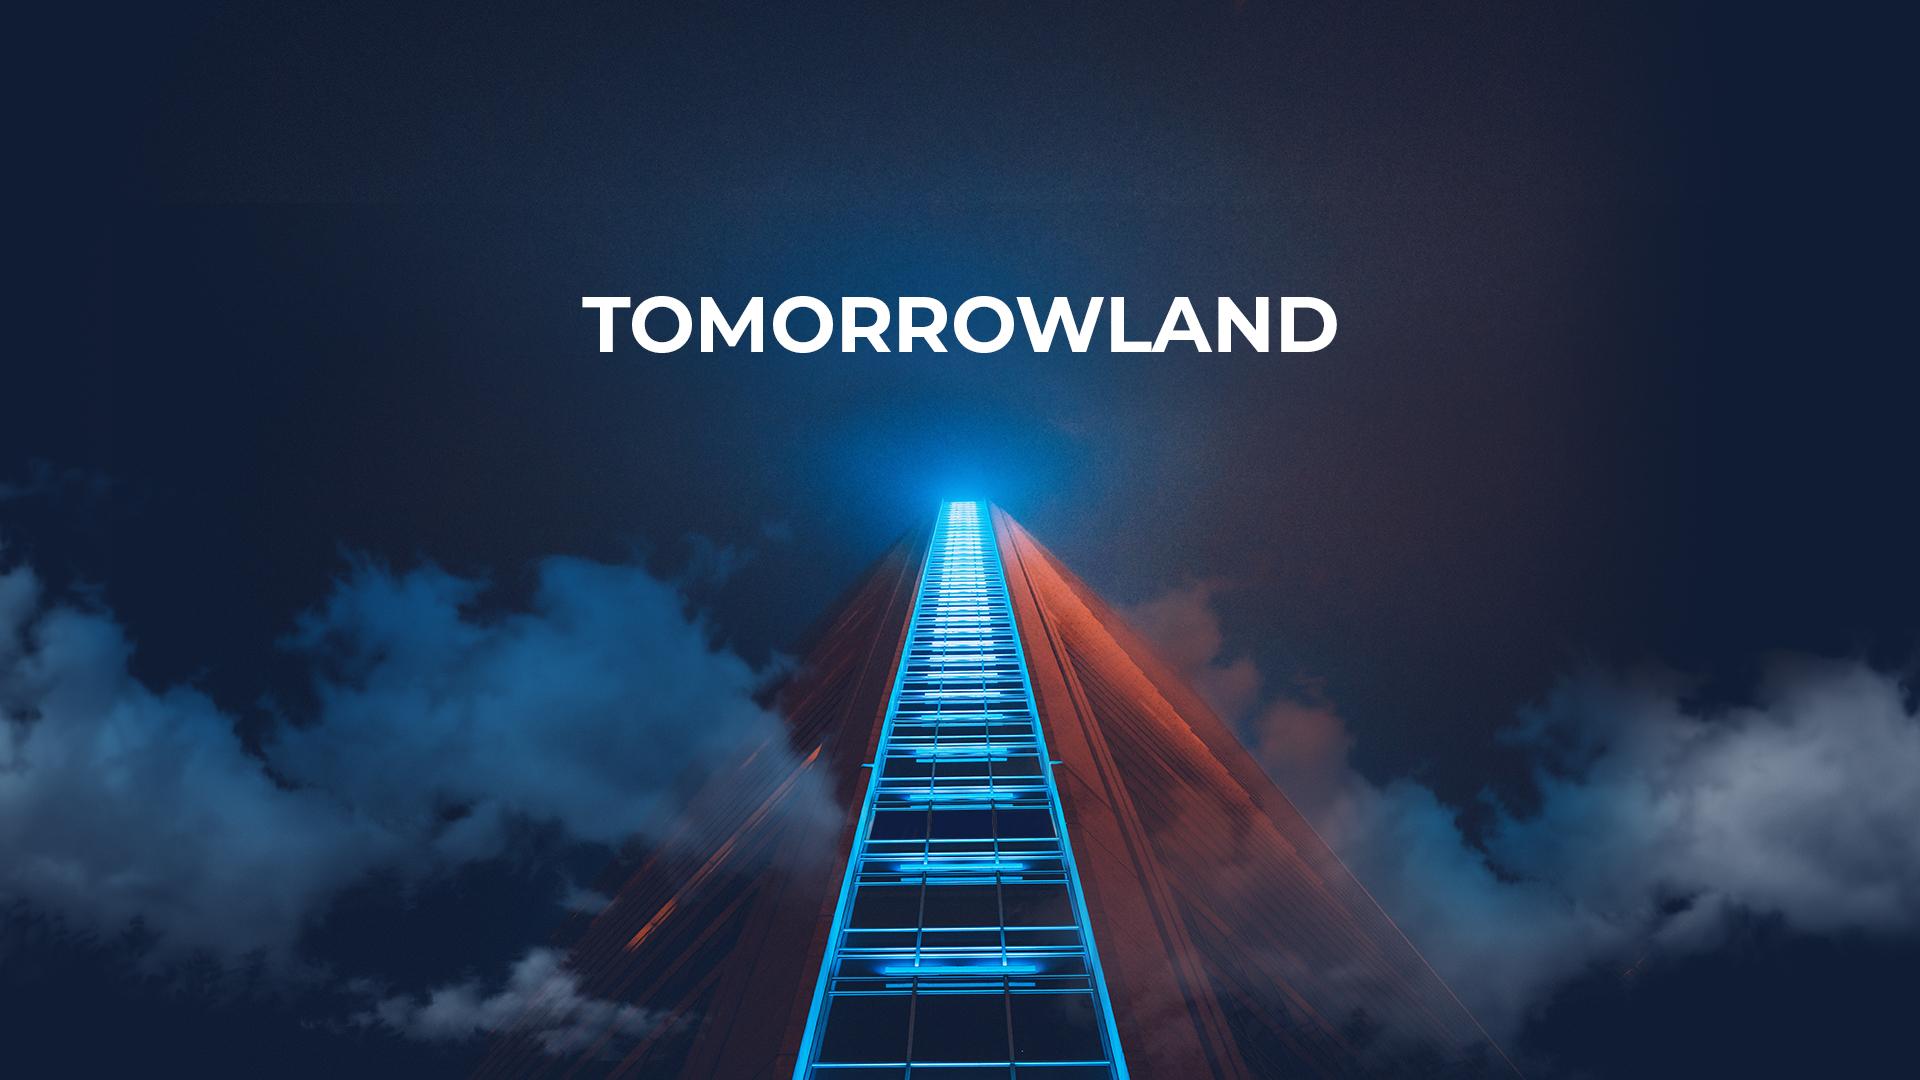 Tomorrowland standard.jpg